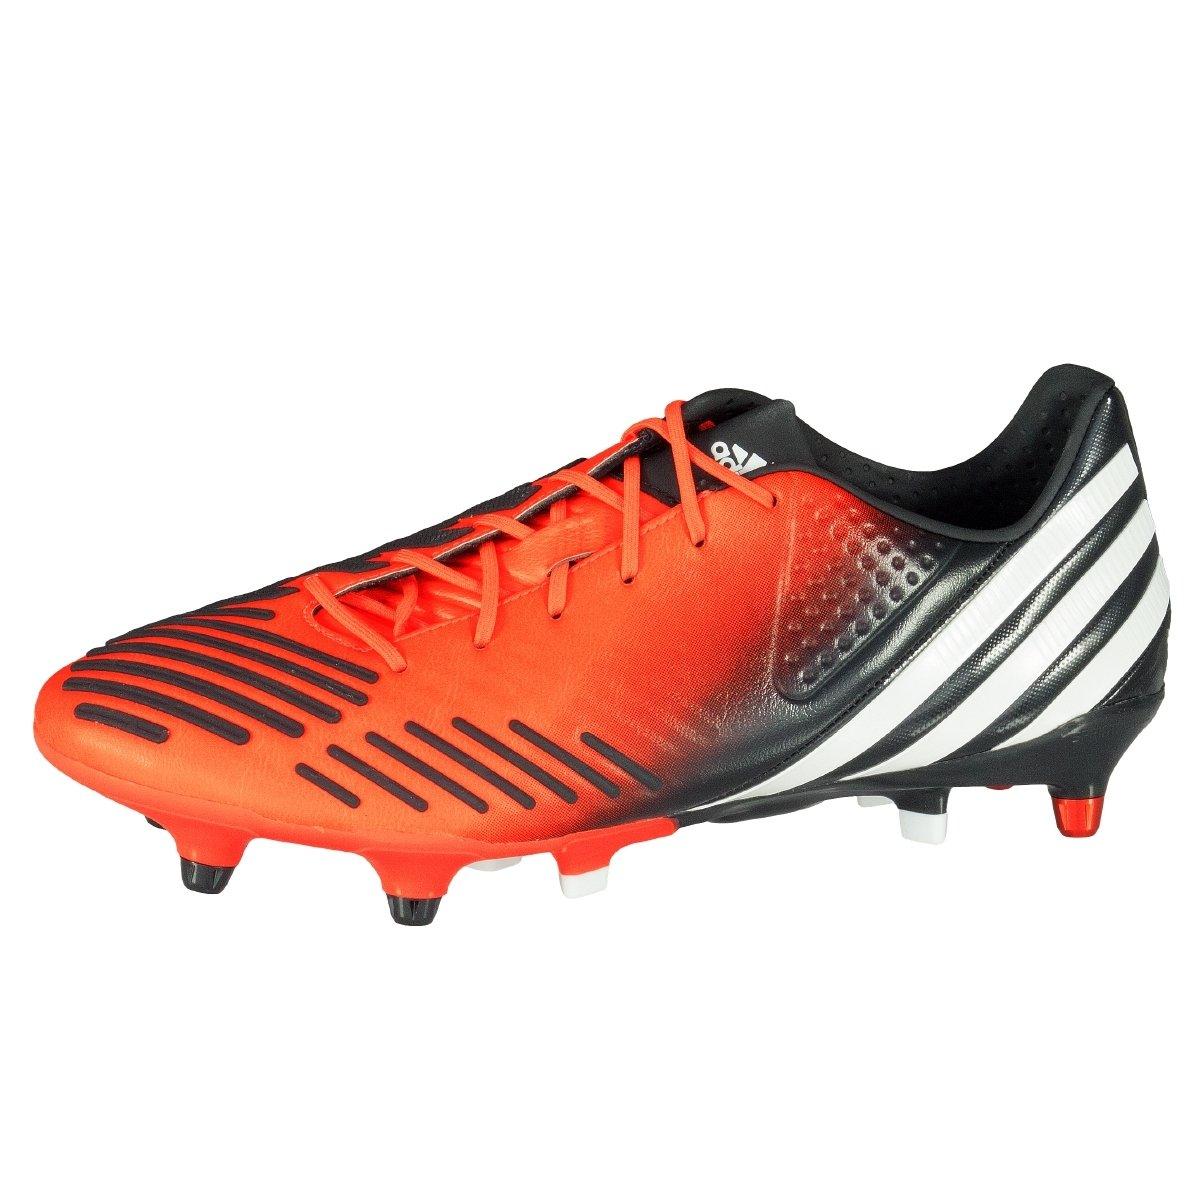 Adidas Fußballschuhe PROTator LZ XTRX SG Herren infraROT-running Weiß-schwarz, 39 1 3, rot